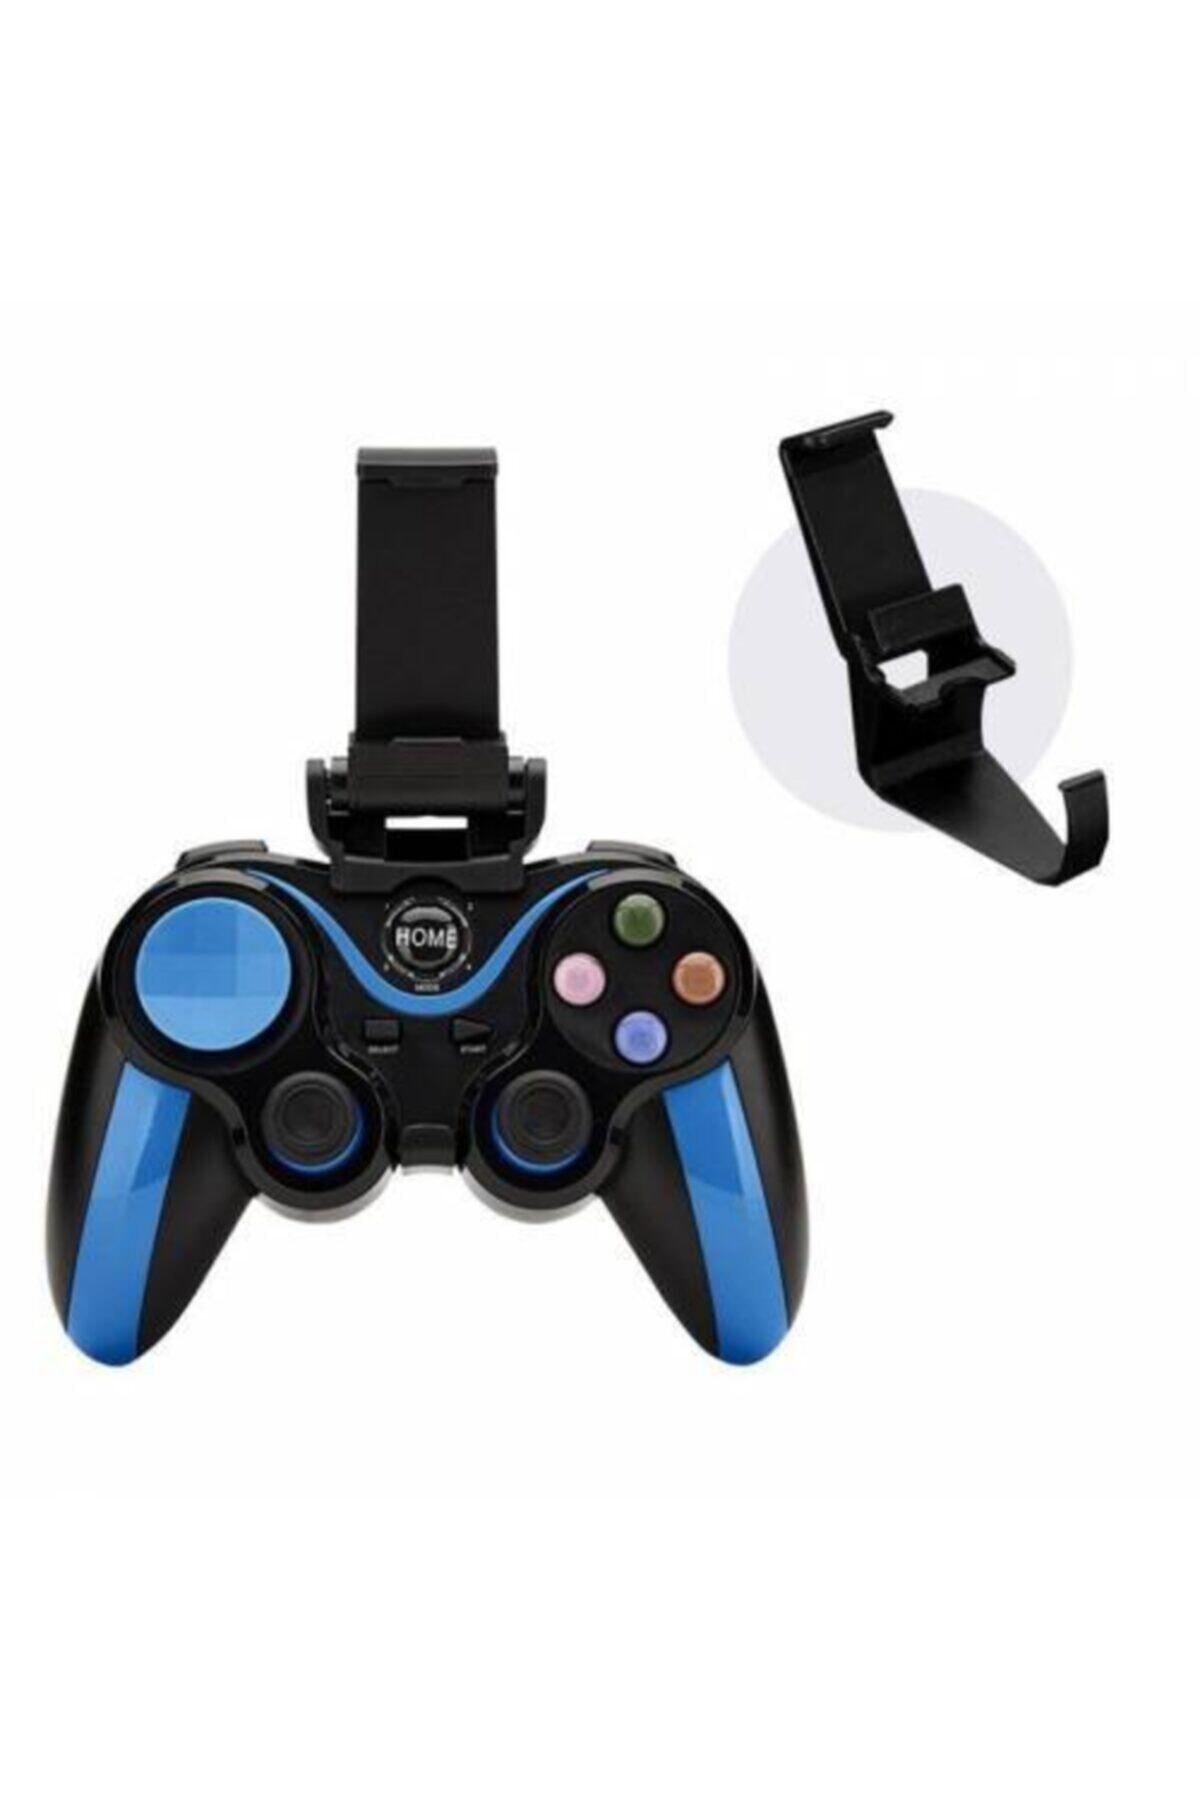 ZERO S9 Bluetooth Kablosuz Mobil Oyun Konsolu Pubg Gamepad 2